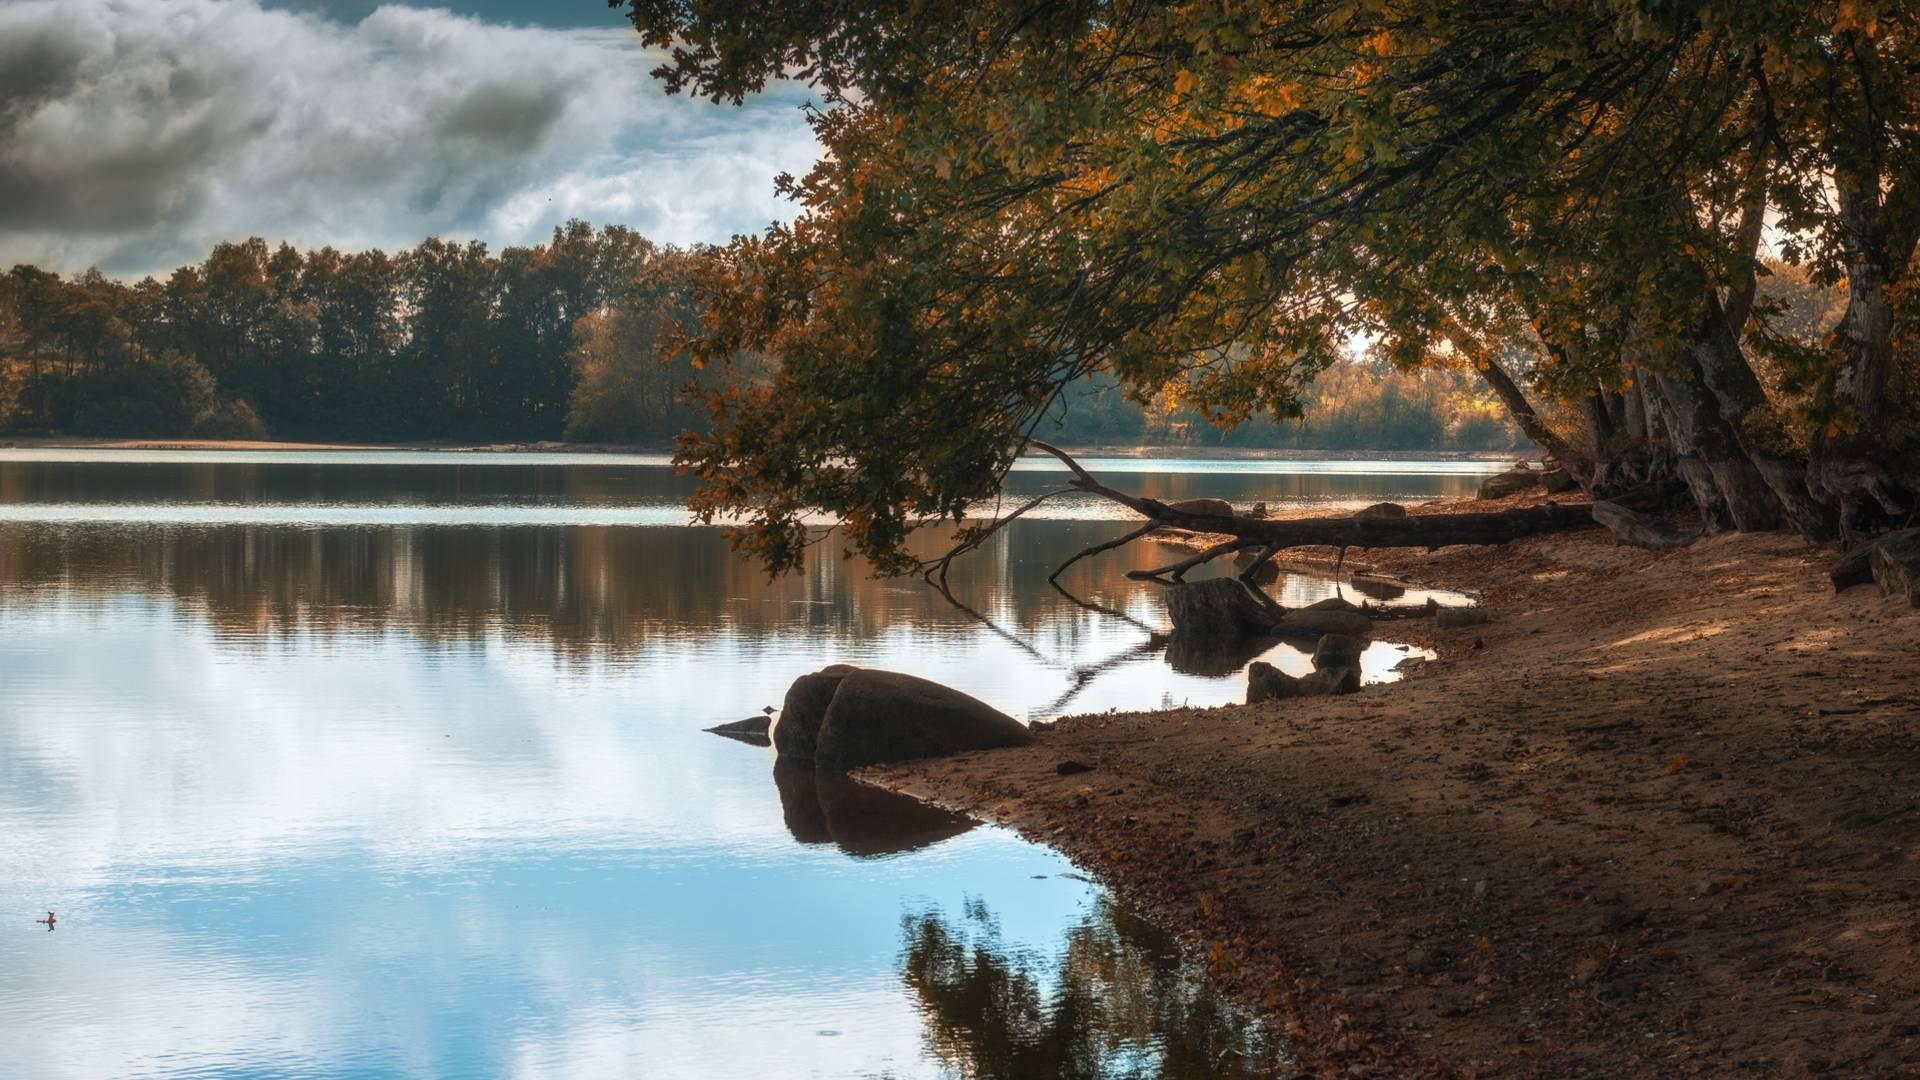 Etang de Brandon. © Oscara Photographe, Creusot Montceau Tourisme.